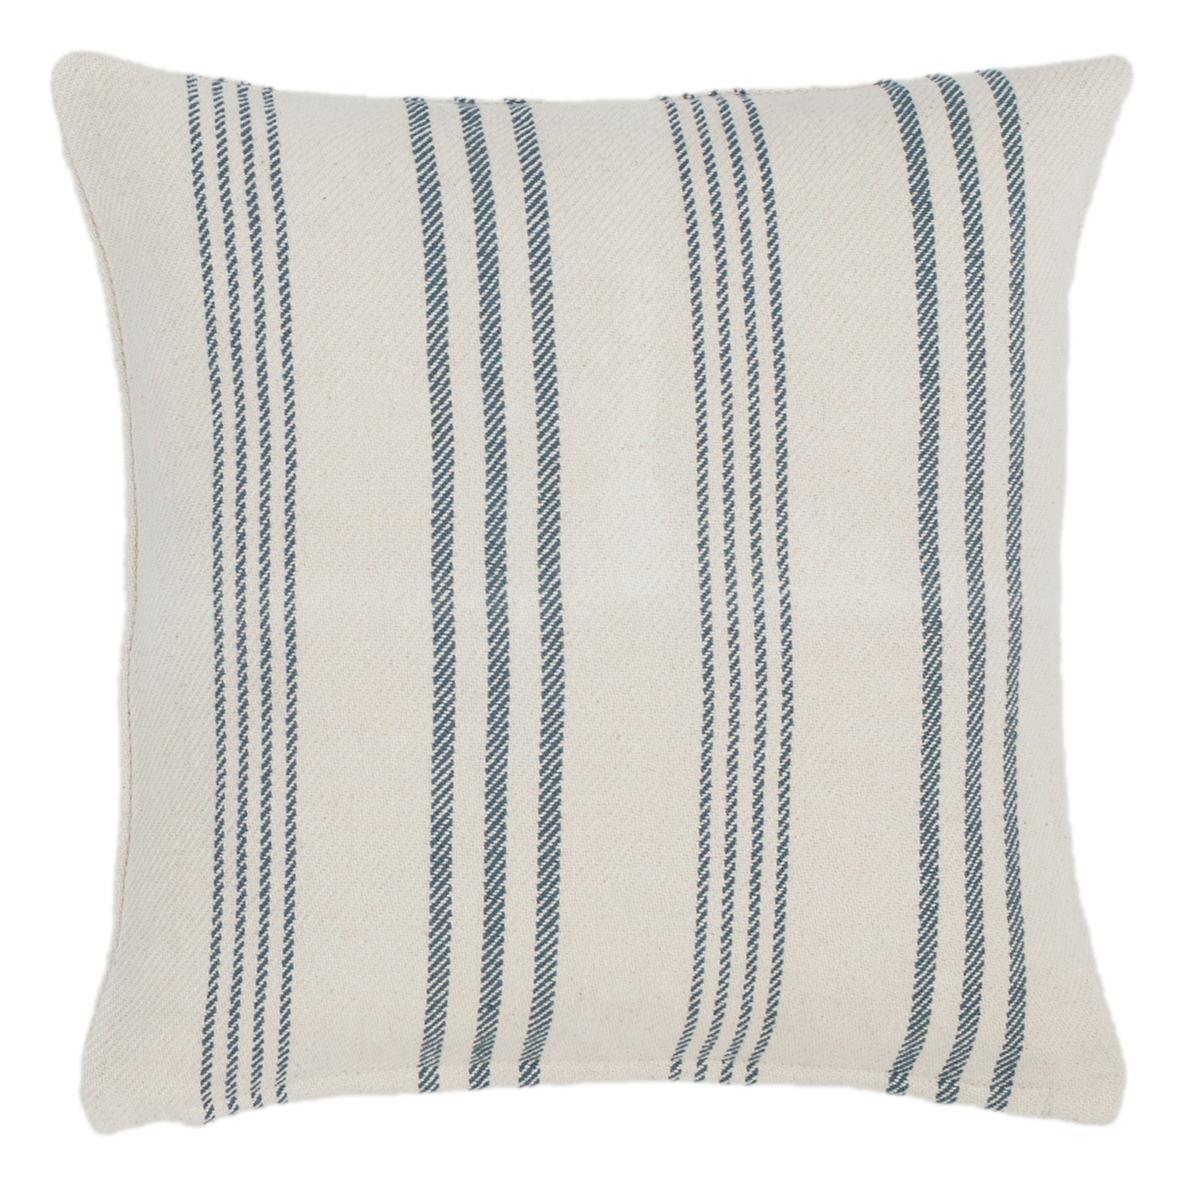 Swedish Stripe Woven Cotton Decorative Pillow